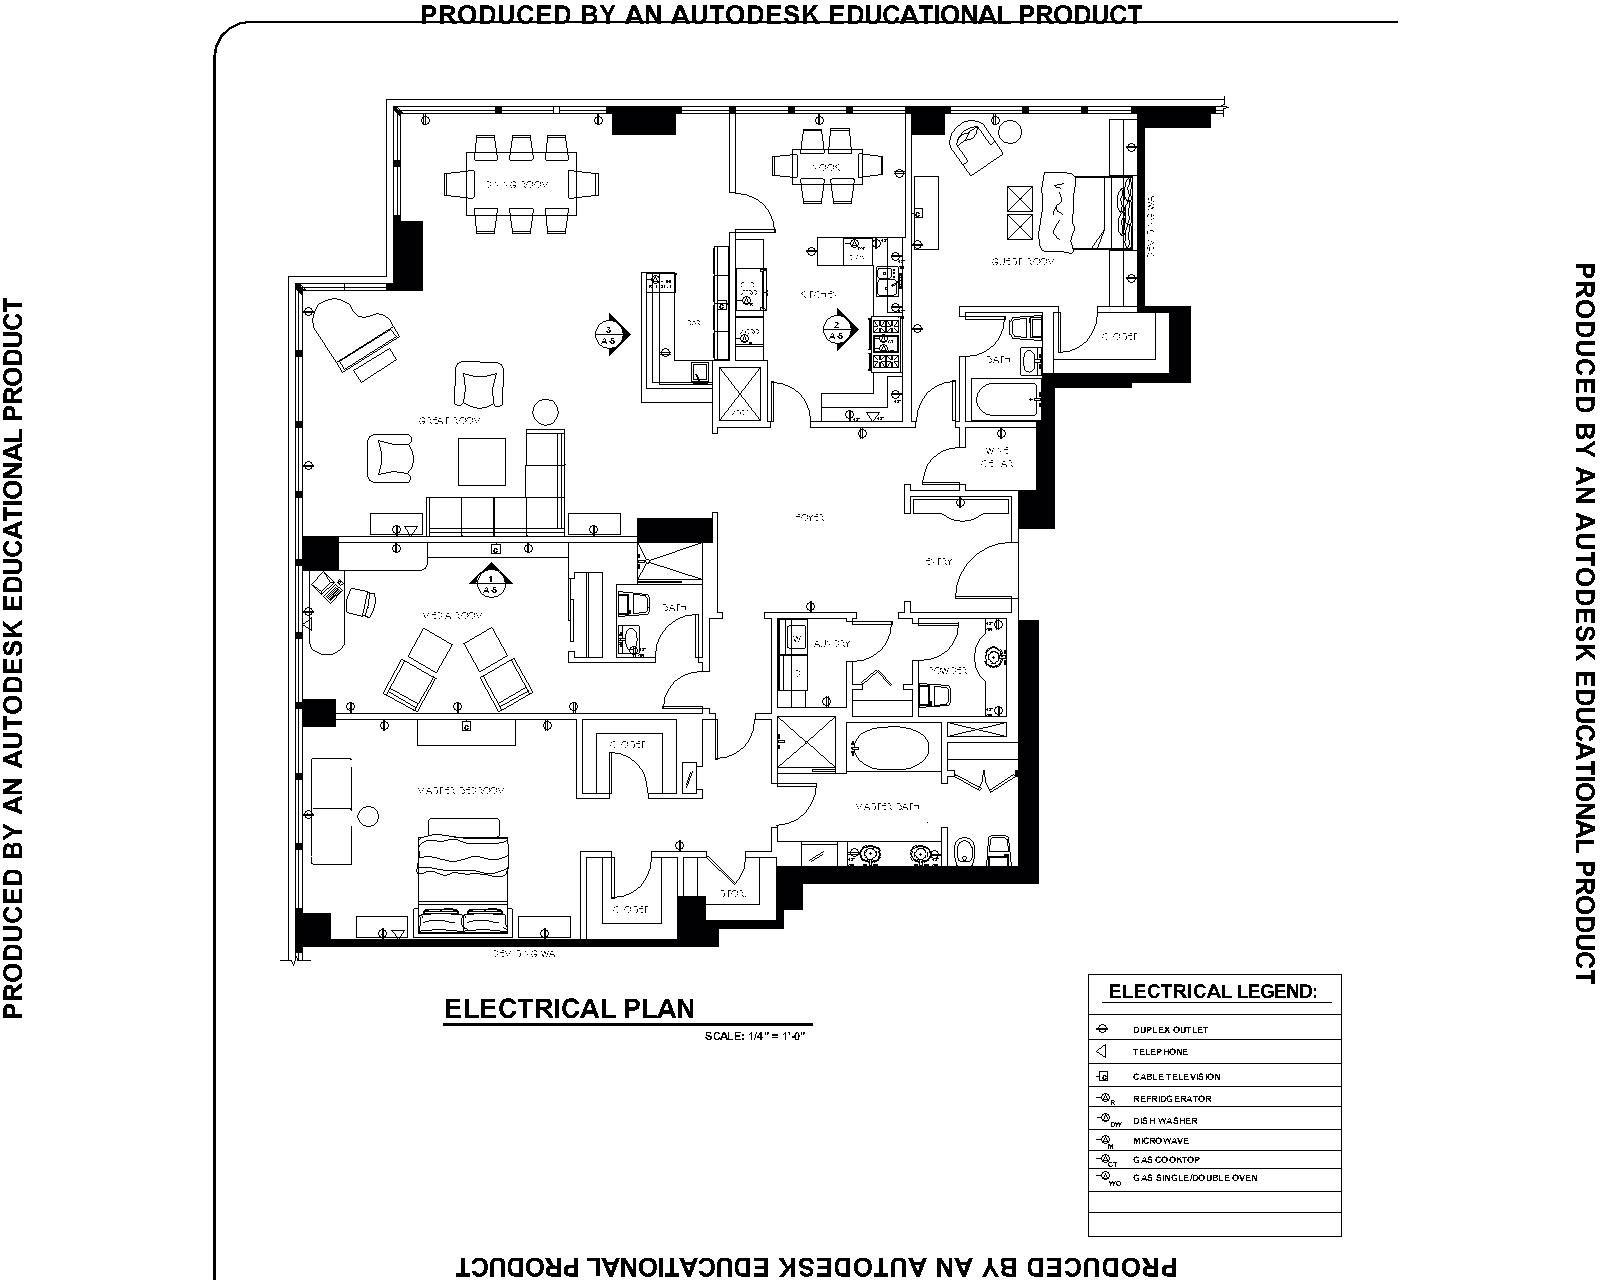 Interior Electrical Plan - Interior Ideas